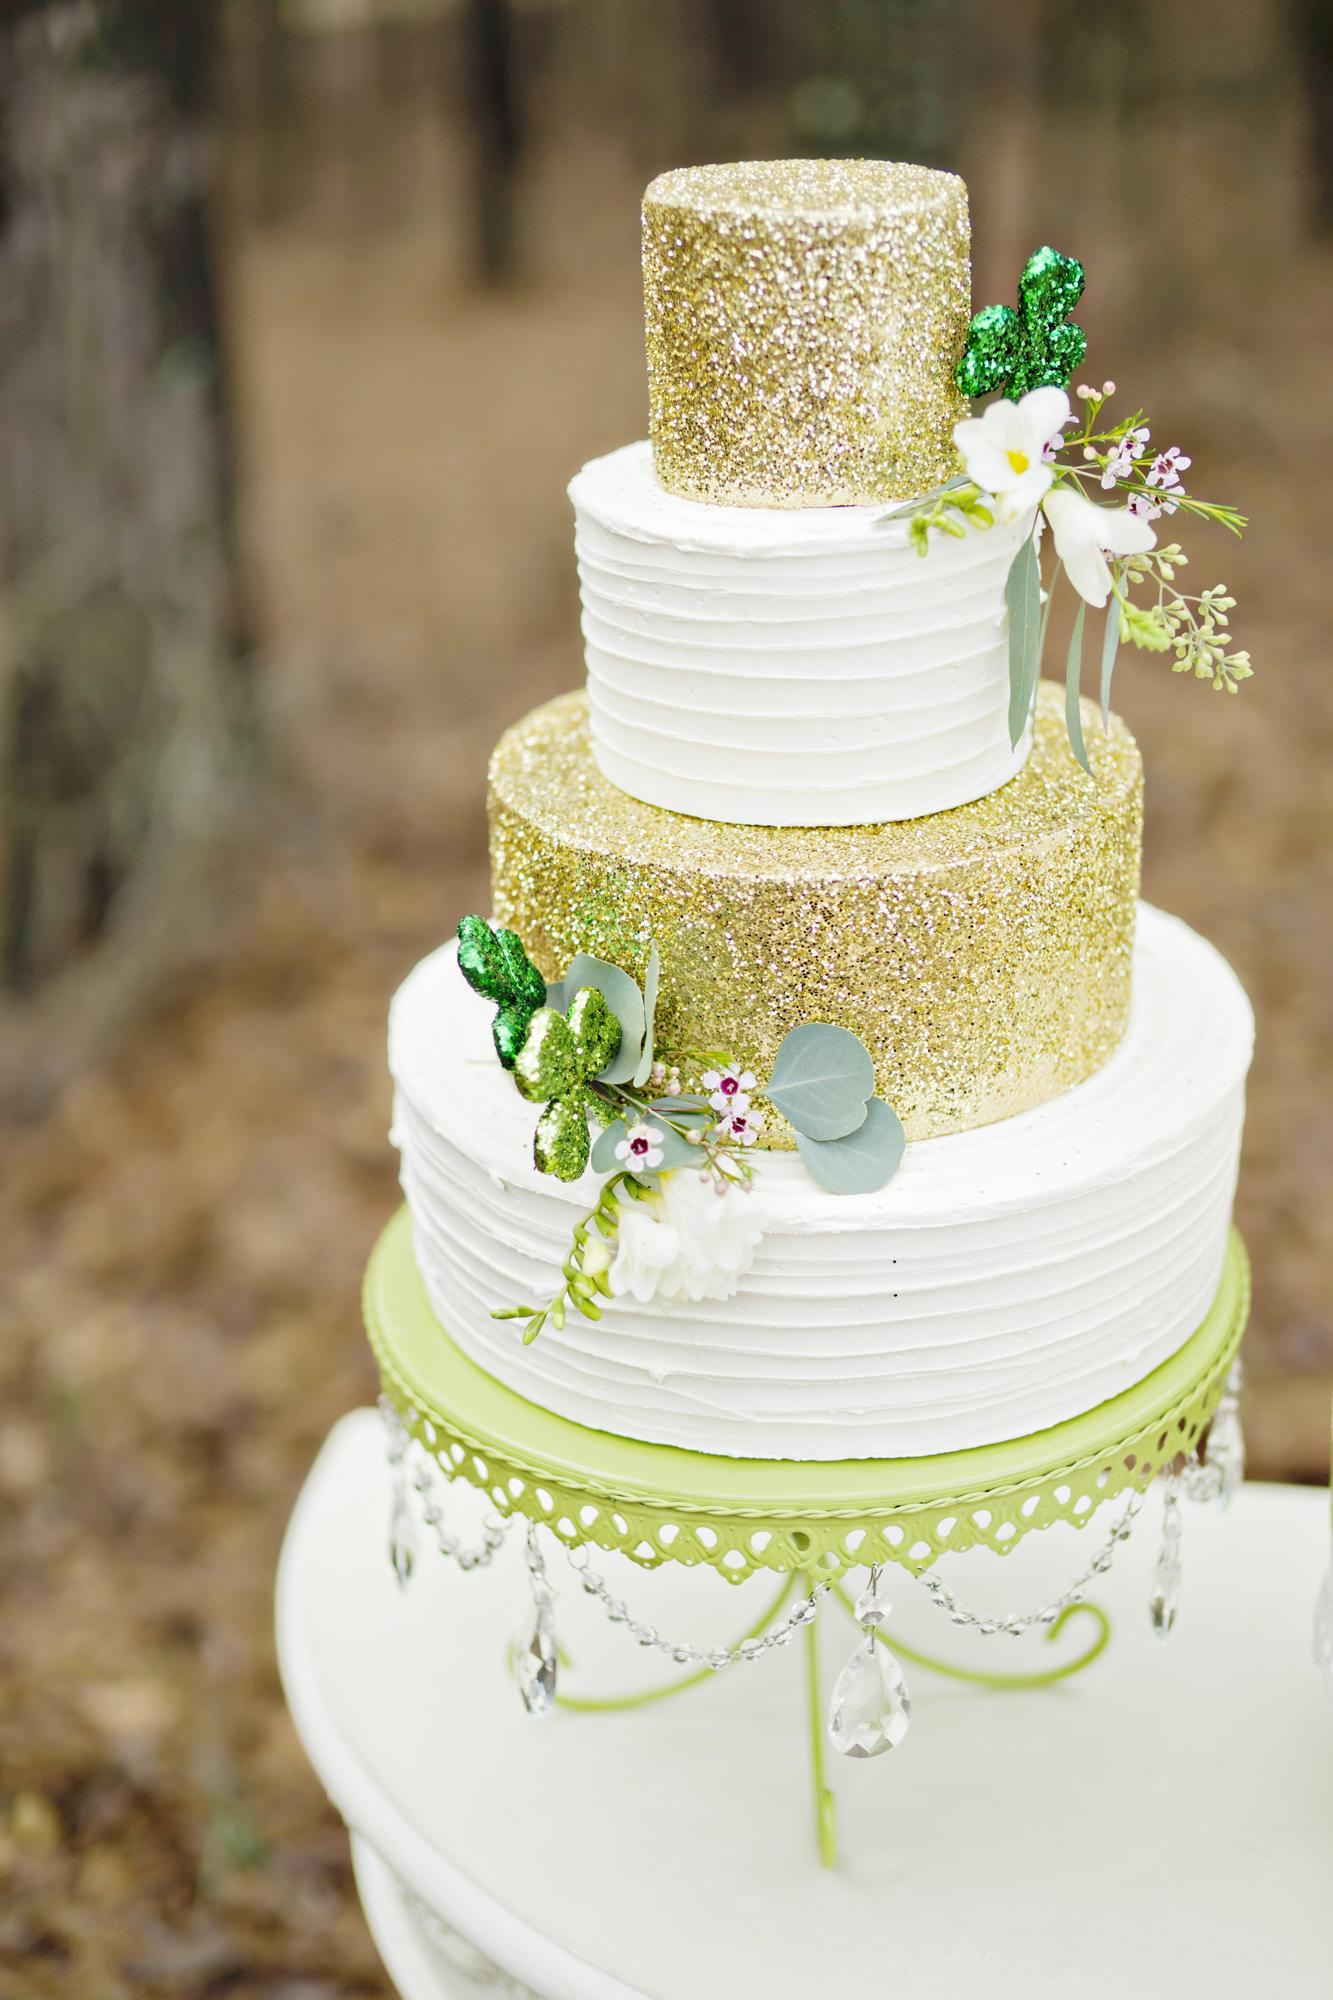 Opulent Treasures Cake Stands Andie Freeman Photo St Patricks Day Wedding02.jpg